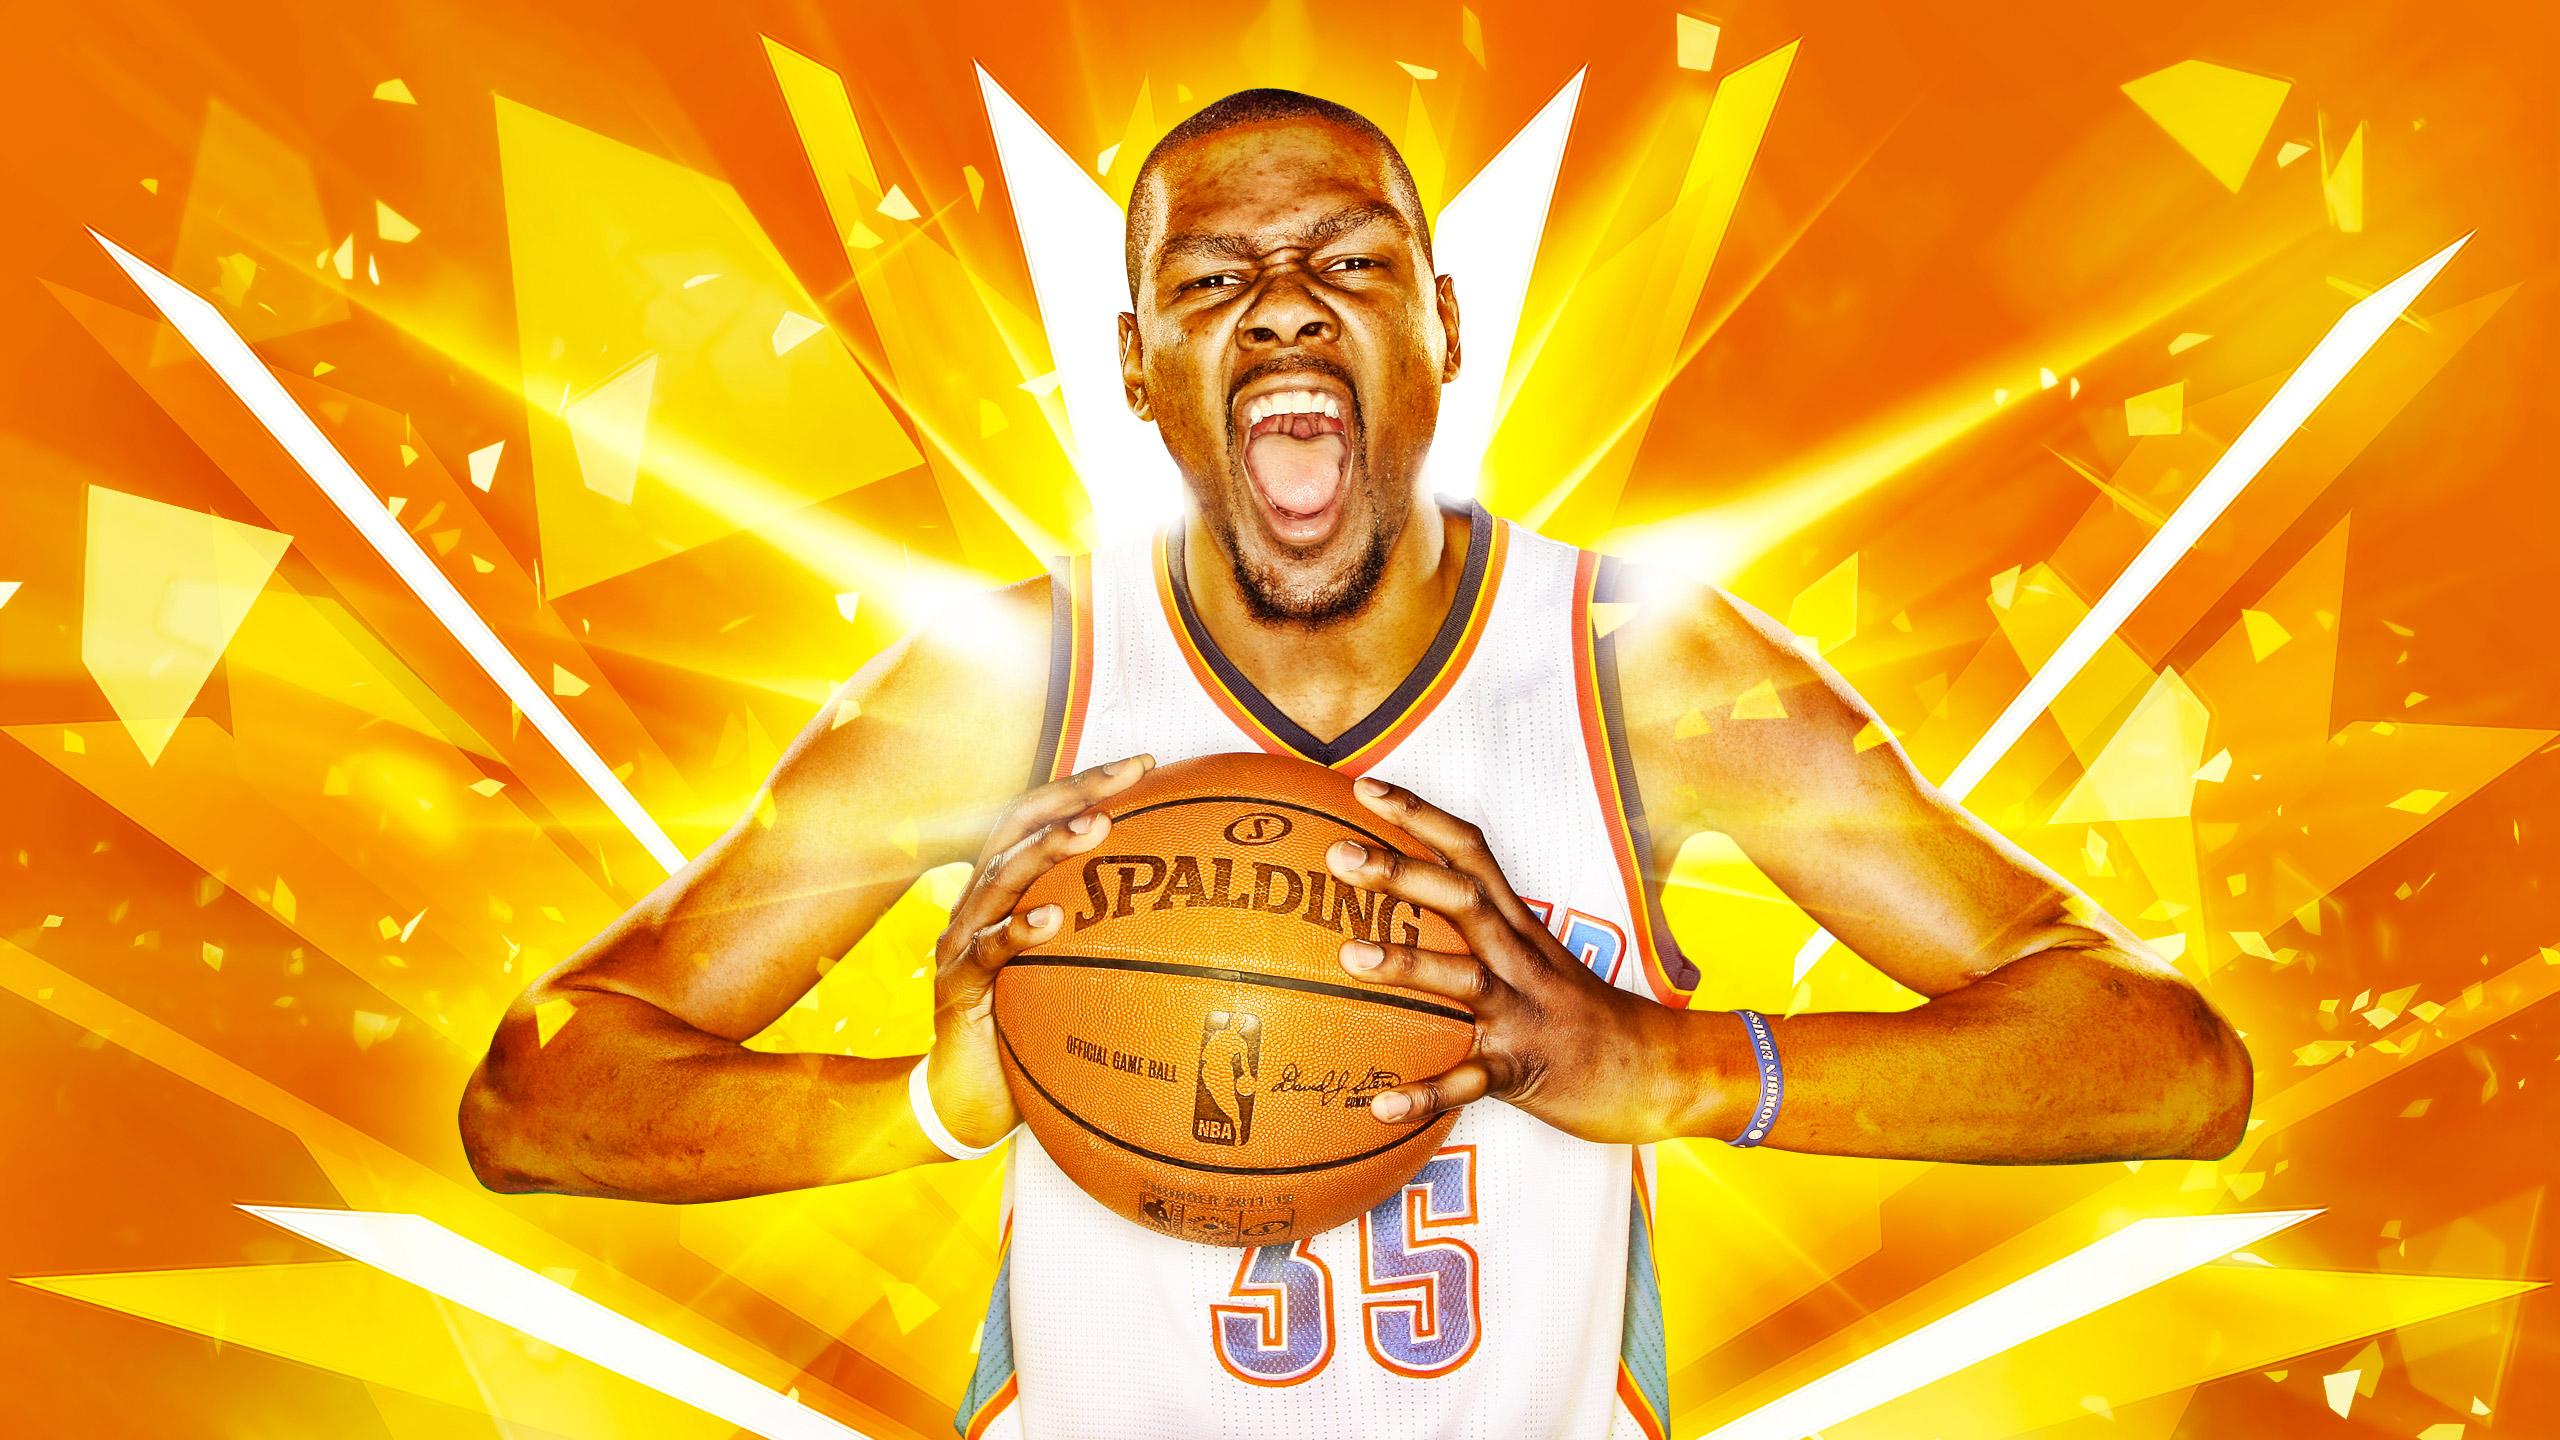 Kevin Durant OKC Thunder 2016 Wallpaper Basketball Wallpapers at 2560x1440